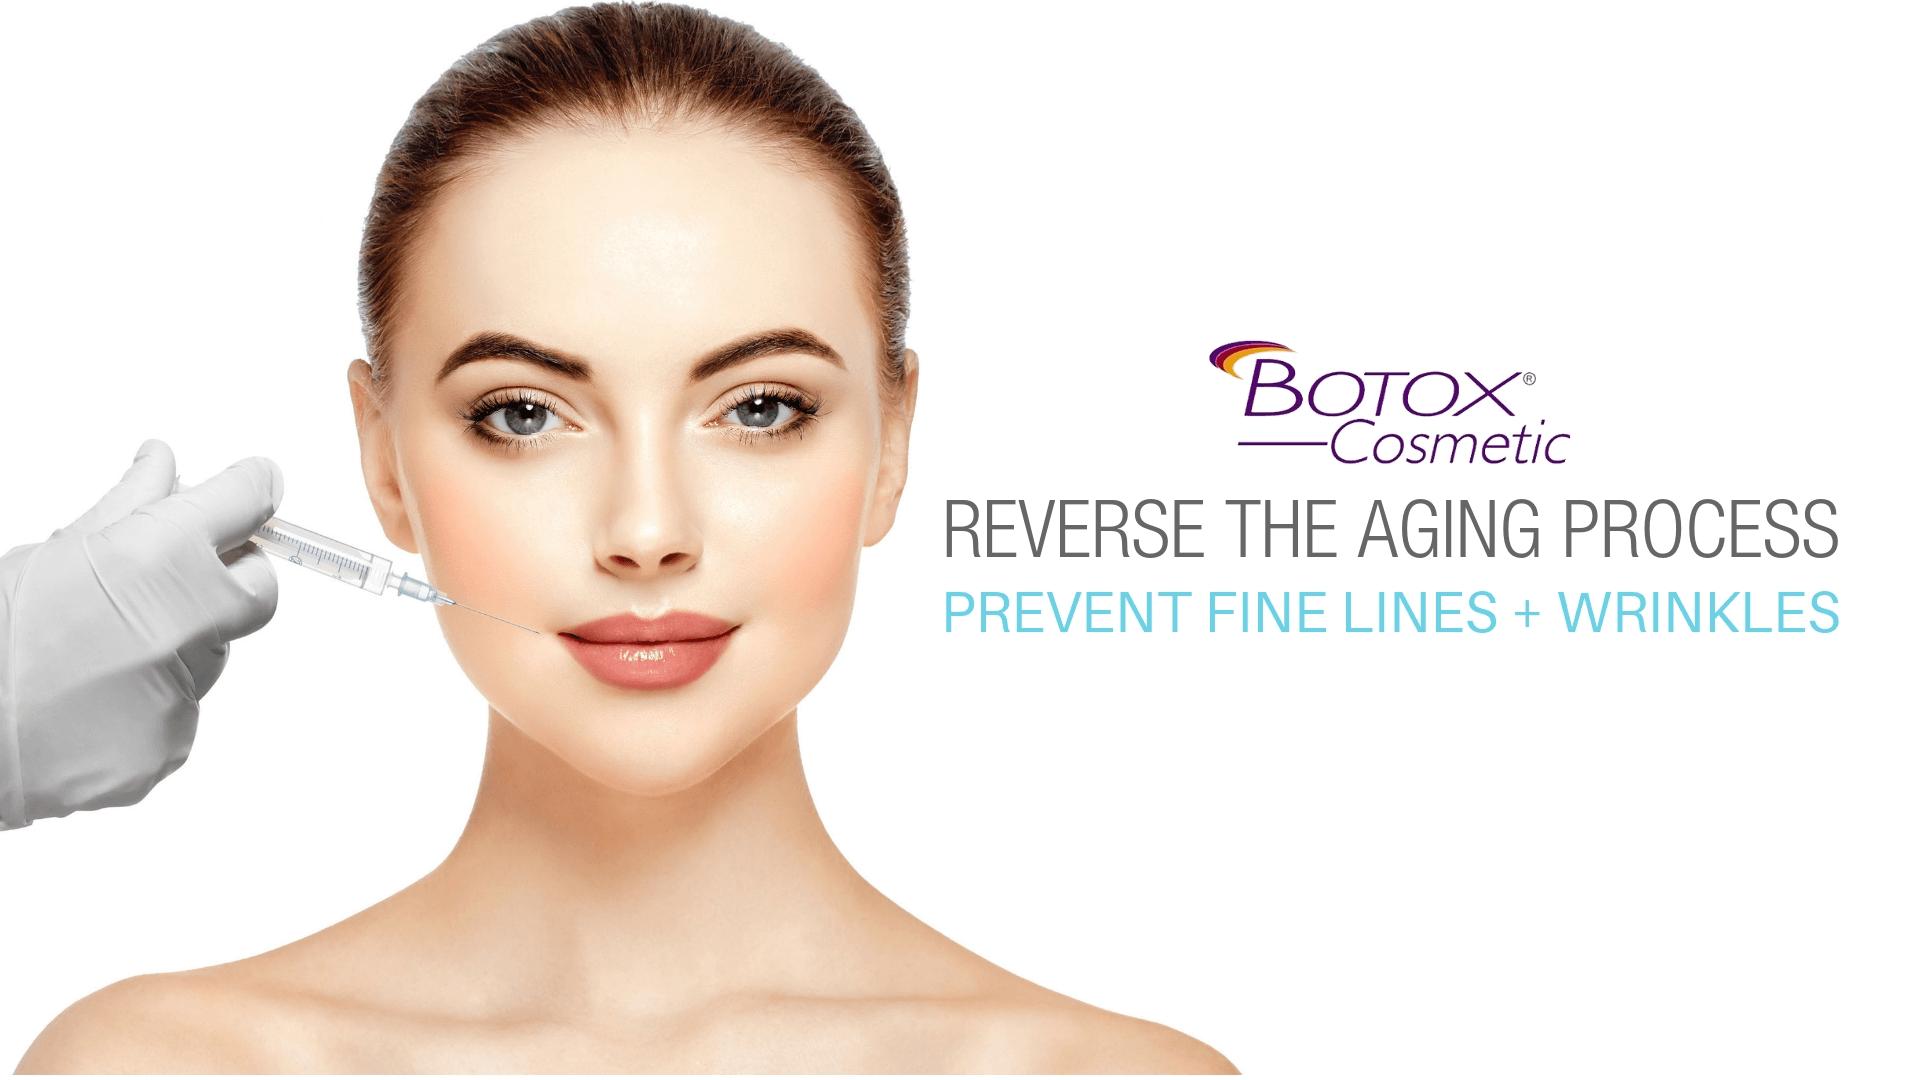 Botox Cosmetics Anti aging Treatments   Bella Vita Med Spa 1920x1080